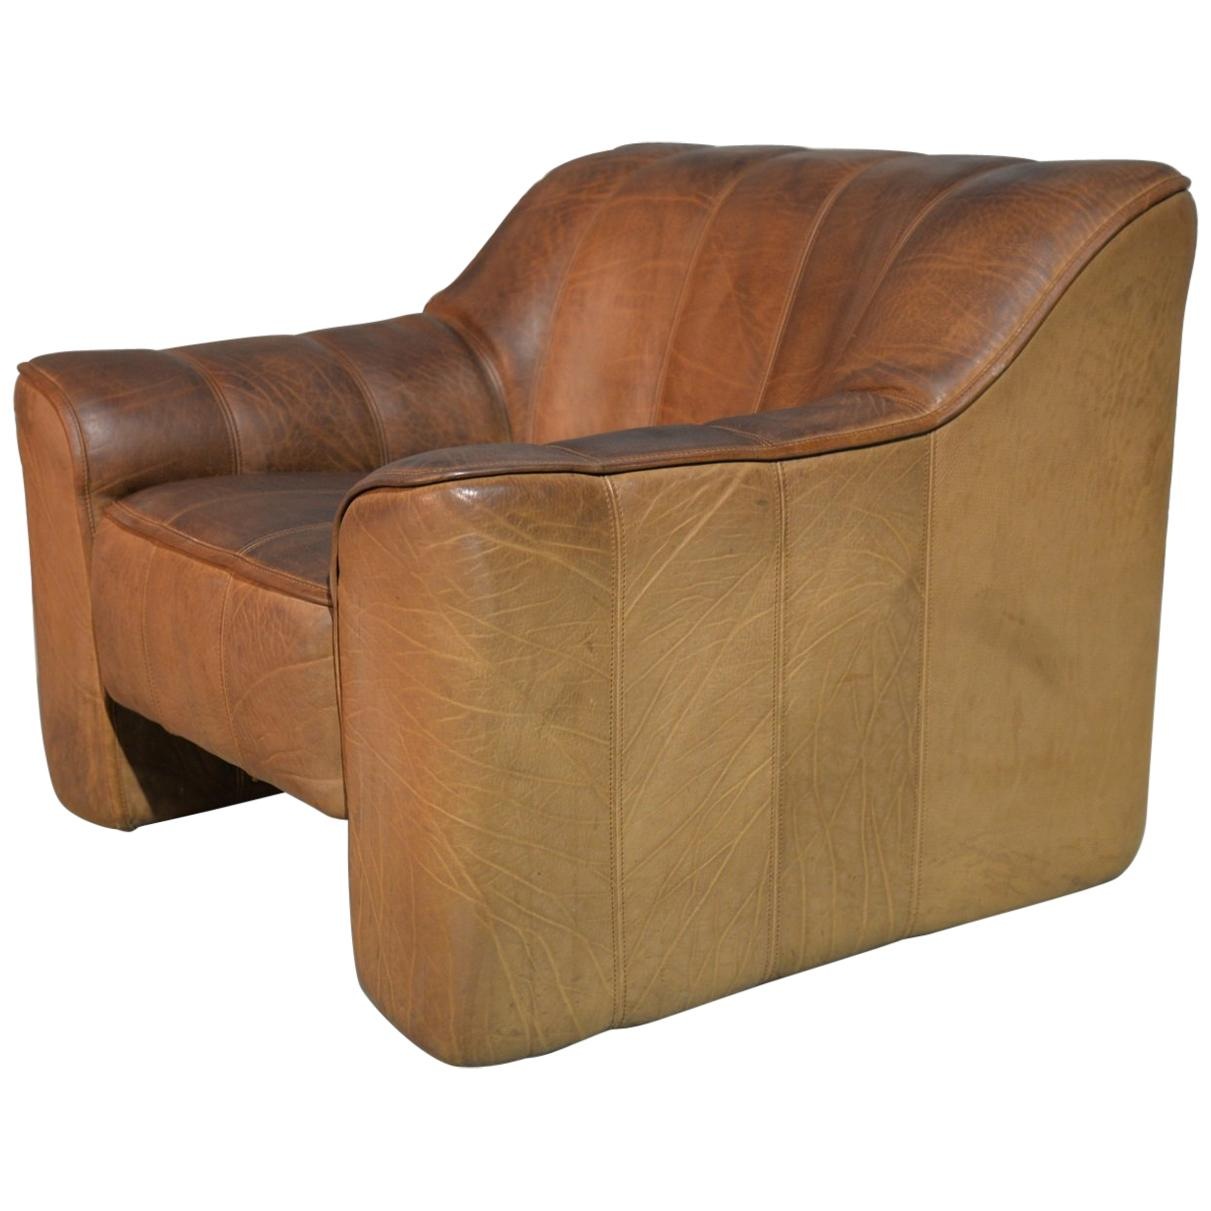 Vintage De Sede DS 44 Leather Armchair, Switzerland 1970s